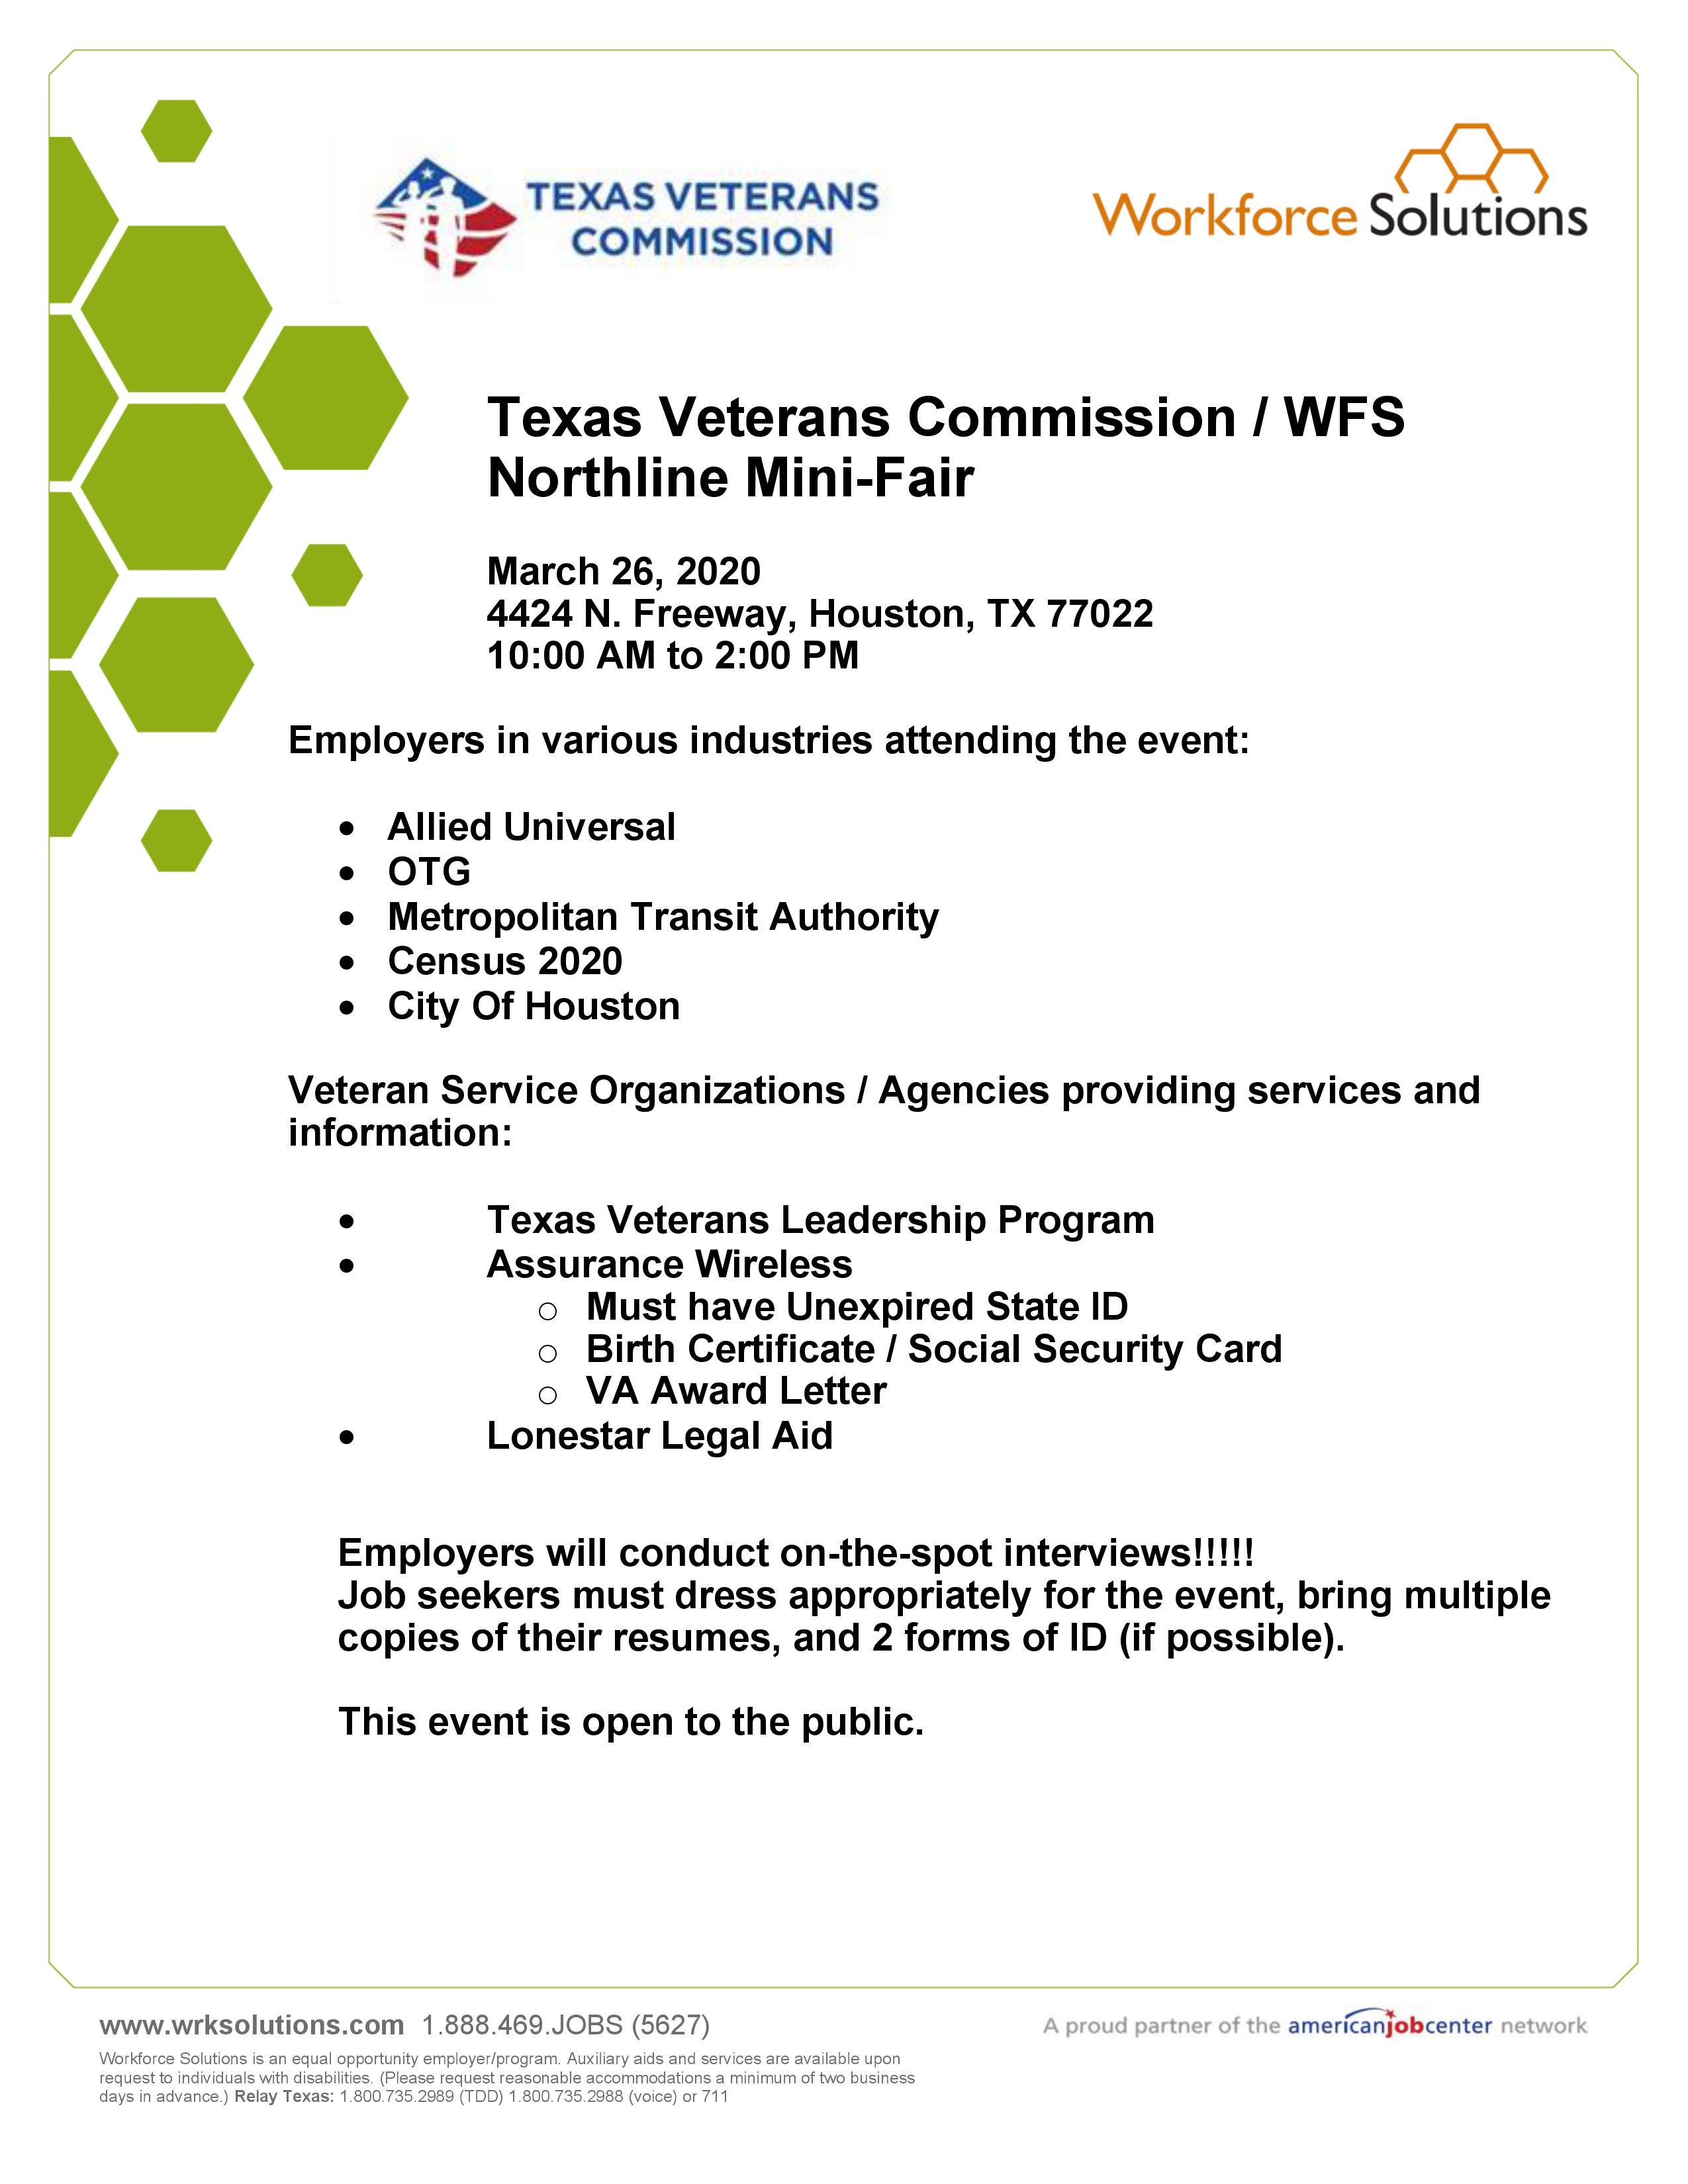 Texas Veterans Mission WFS Northline Mini Fair Texas